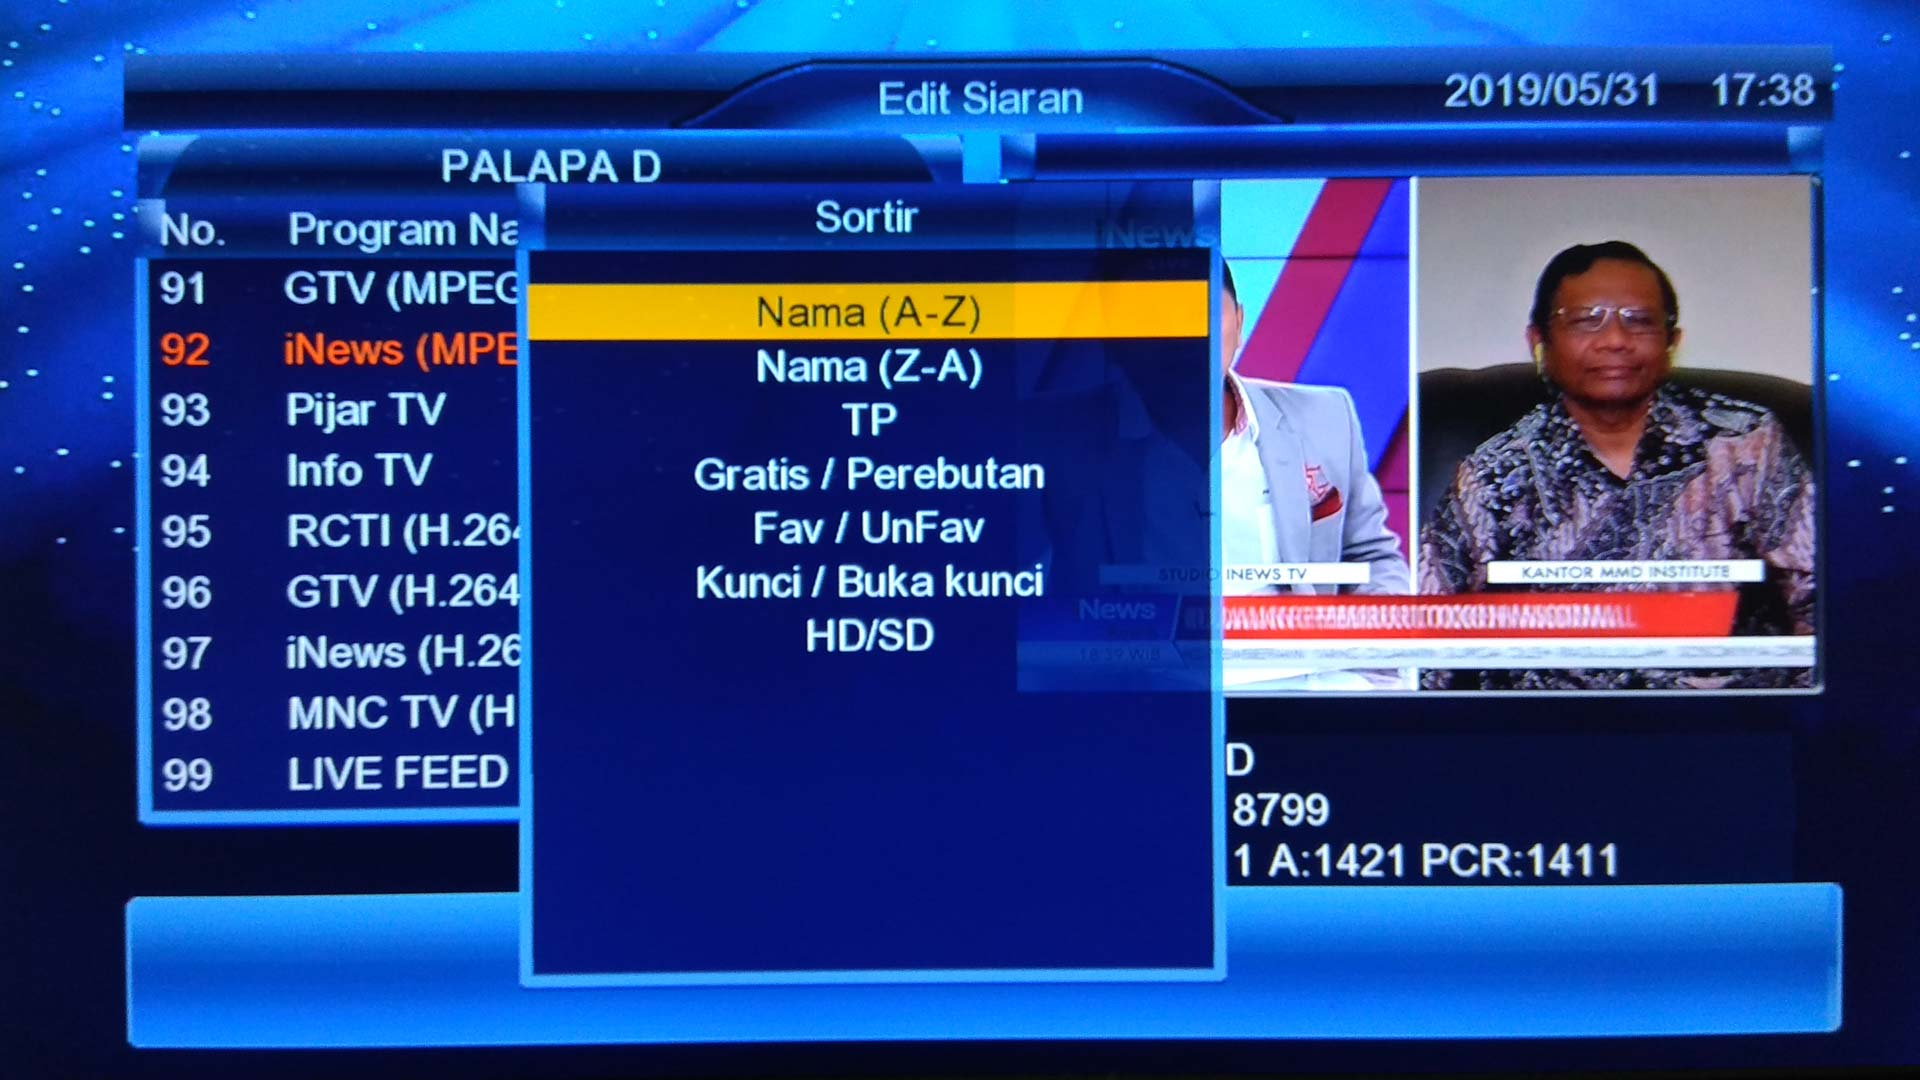 Cara Mengurutkan Chanel TV Parabola Goldsat Lily HD